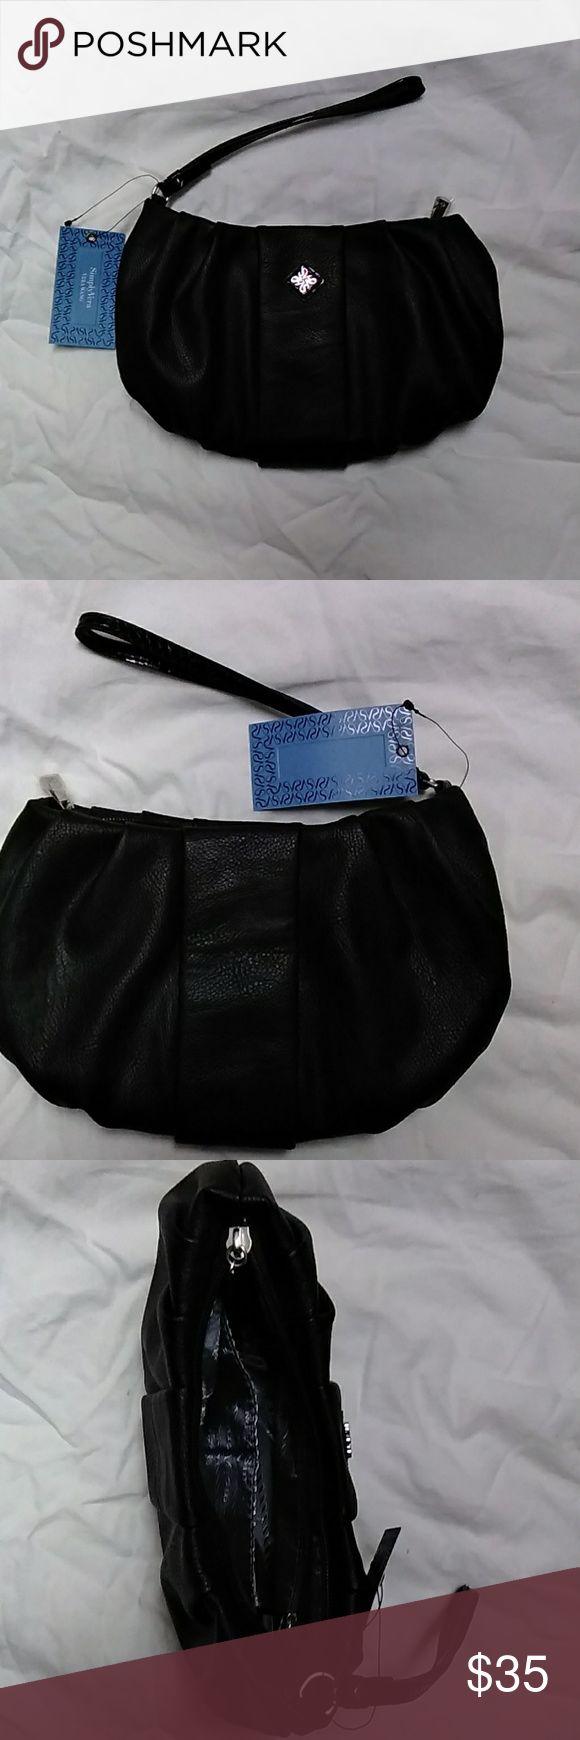 Simply Vera, Vera Wang Women's Wristlet Simply Vera, Vera Wang Women's Wristlet.  Black faux leather.  Multi card slots. One zippered inside pocket. NWT. Simply Vera Vera Wang Bags Clutches & Wristlets